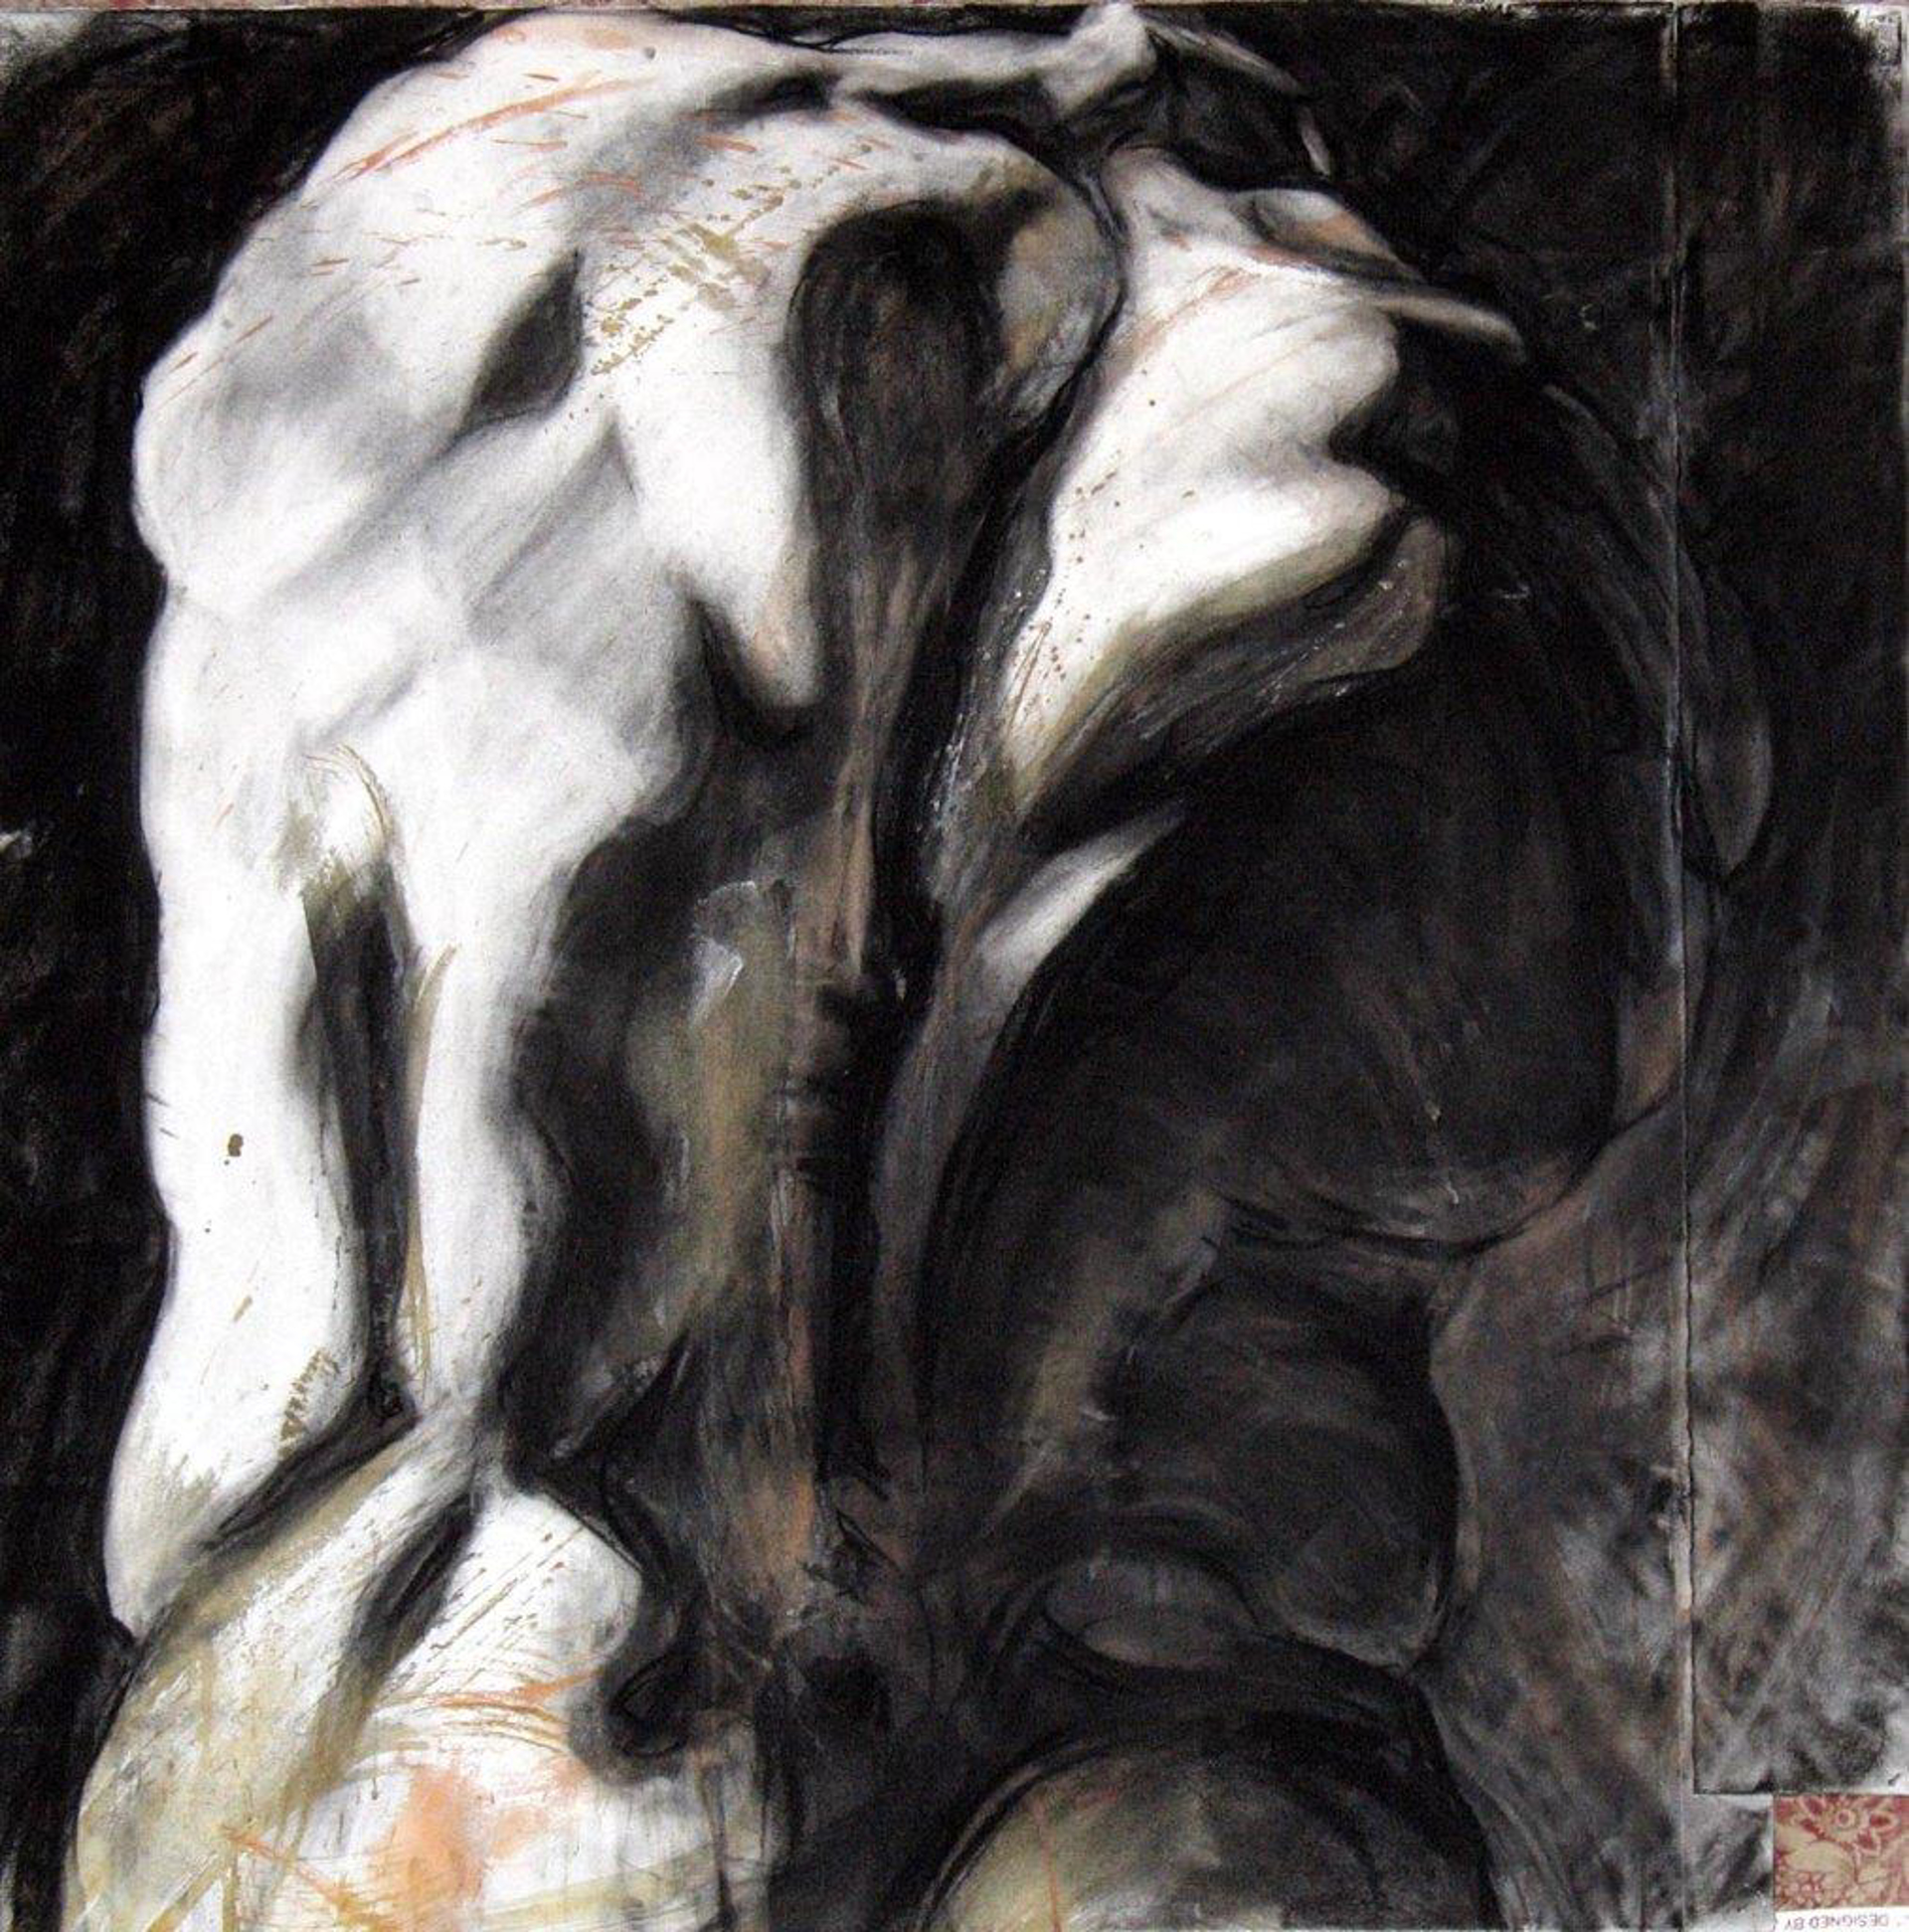 Belvedere Torso 1 Back by Lisa VanderHill